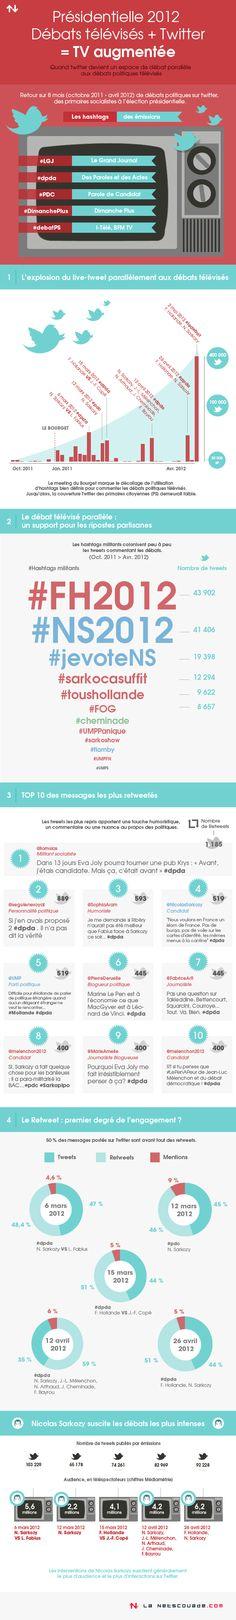 Présidentielle 2012 : Débats télévisés + Twitter = TV augmentée